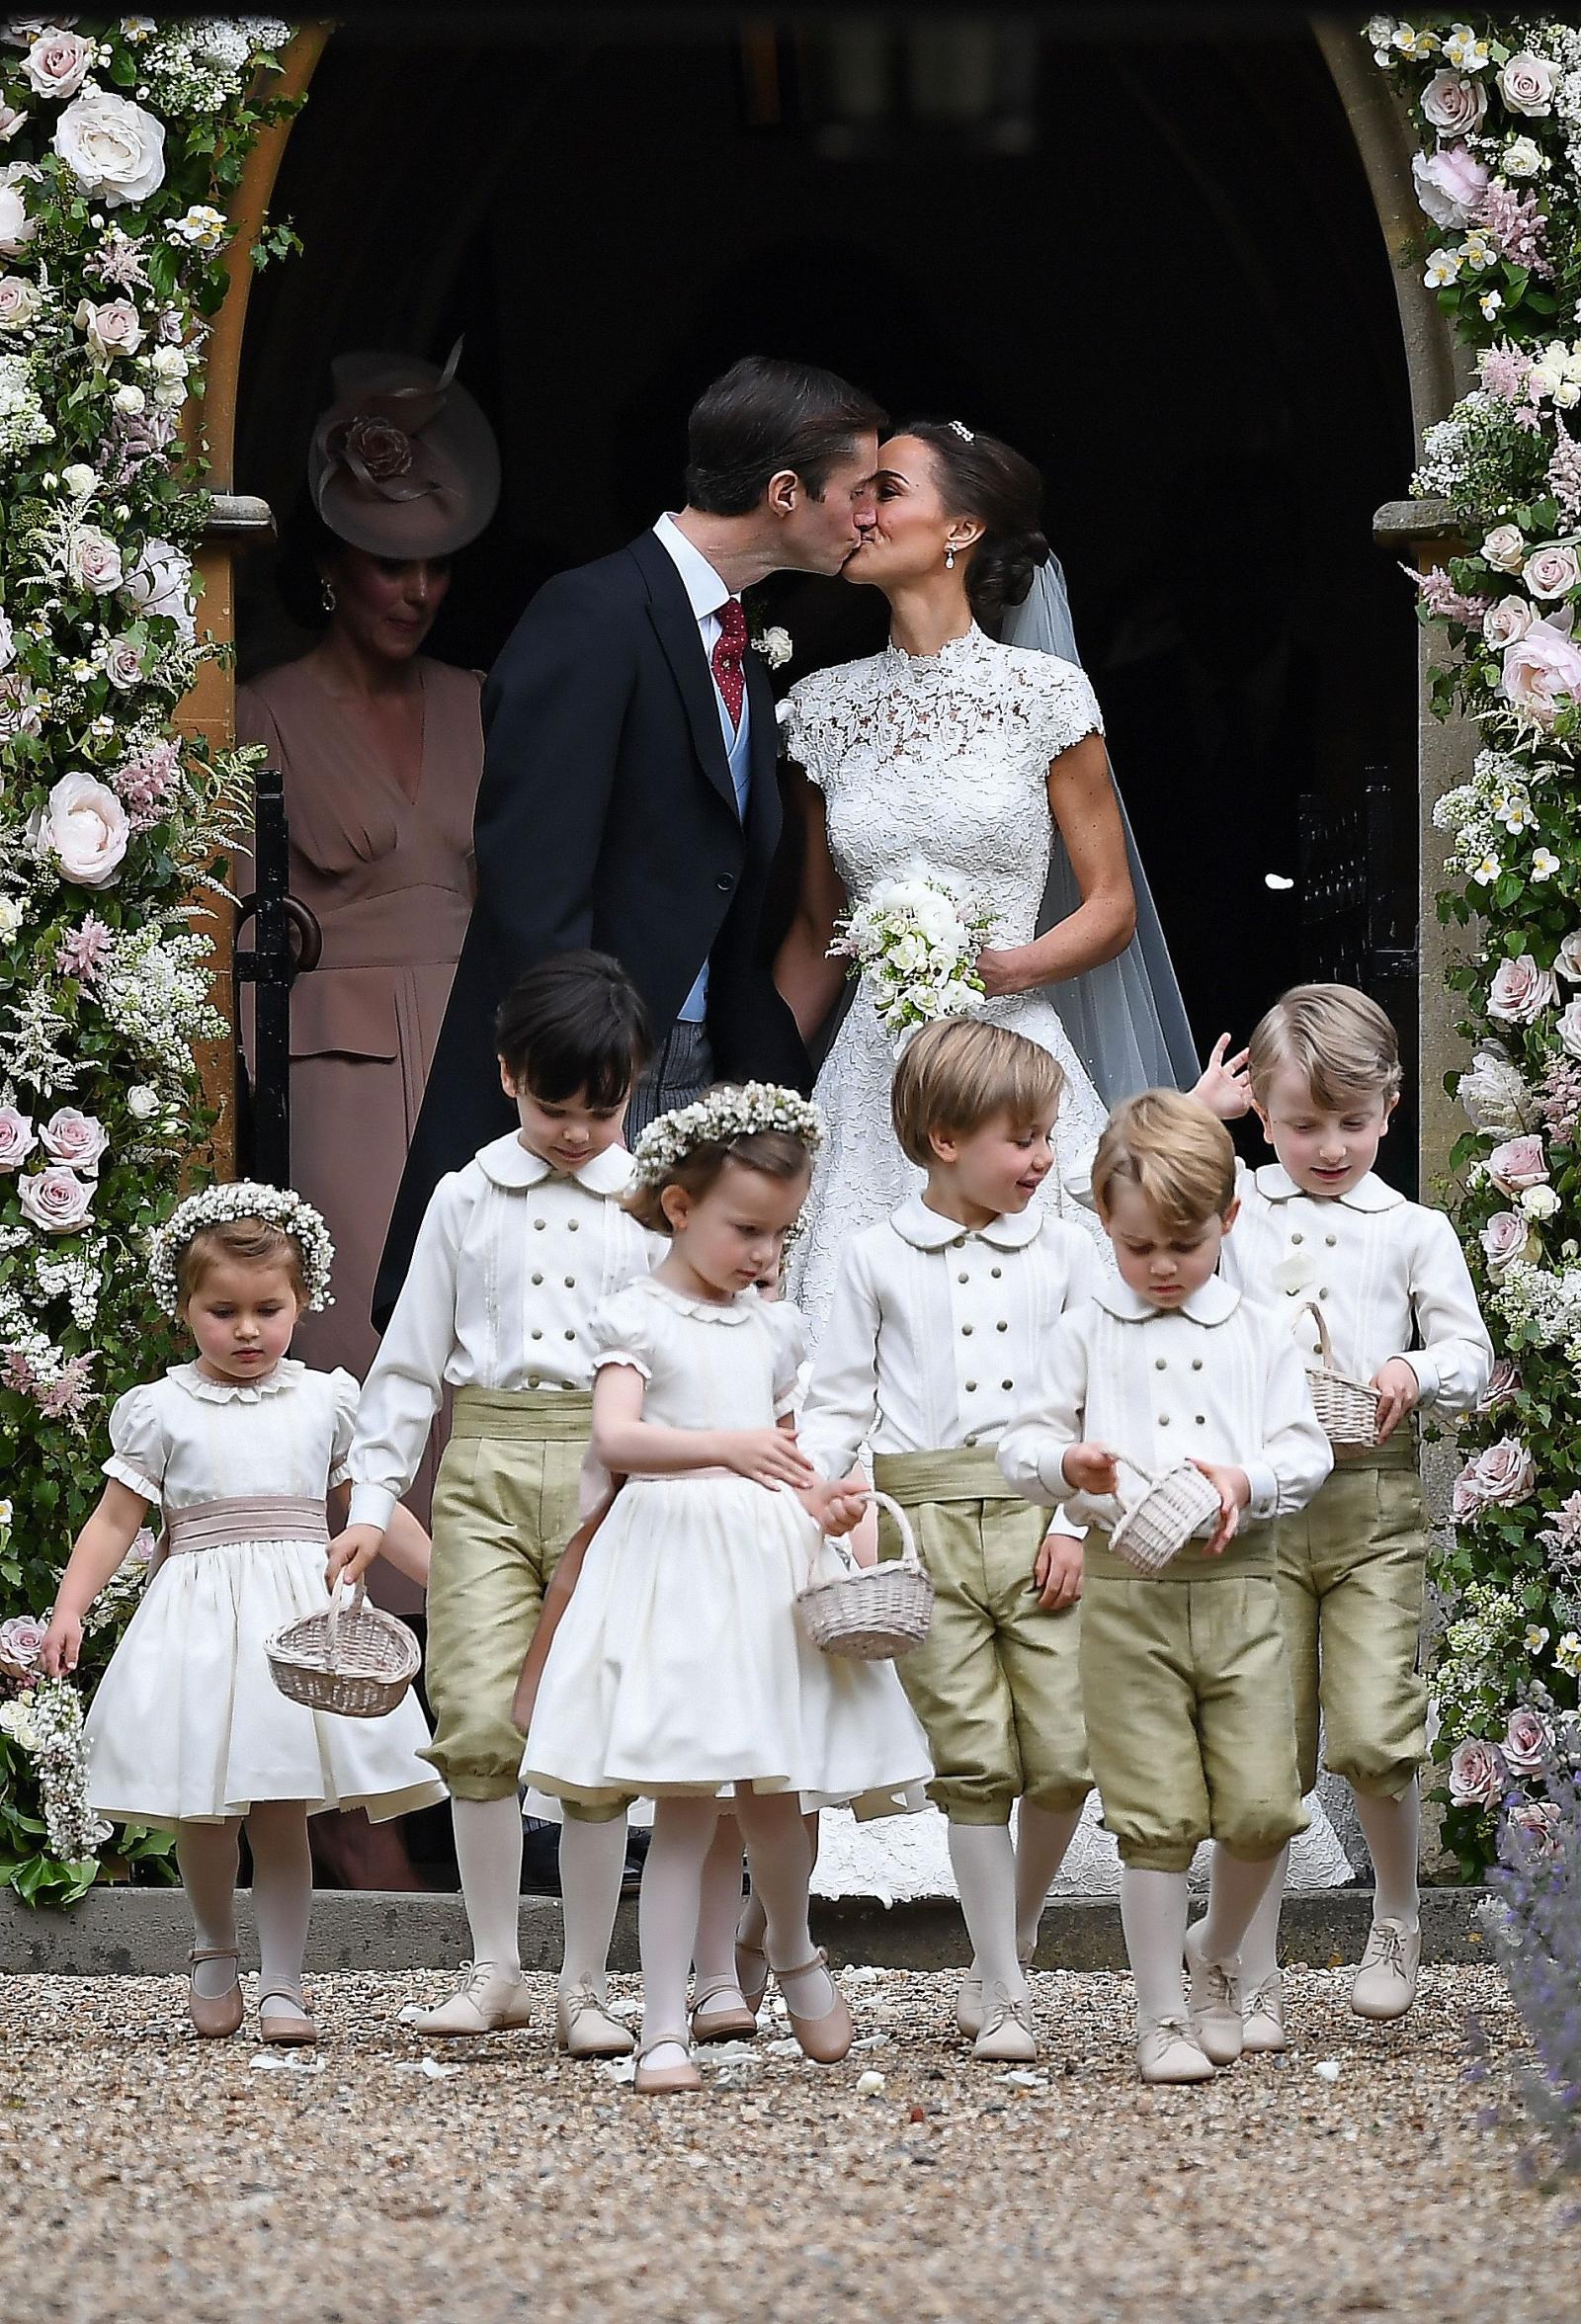 Matrimonio In Spanish : Pippa middleton marries james matthews the wedding live